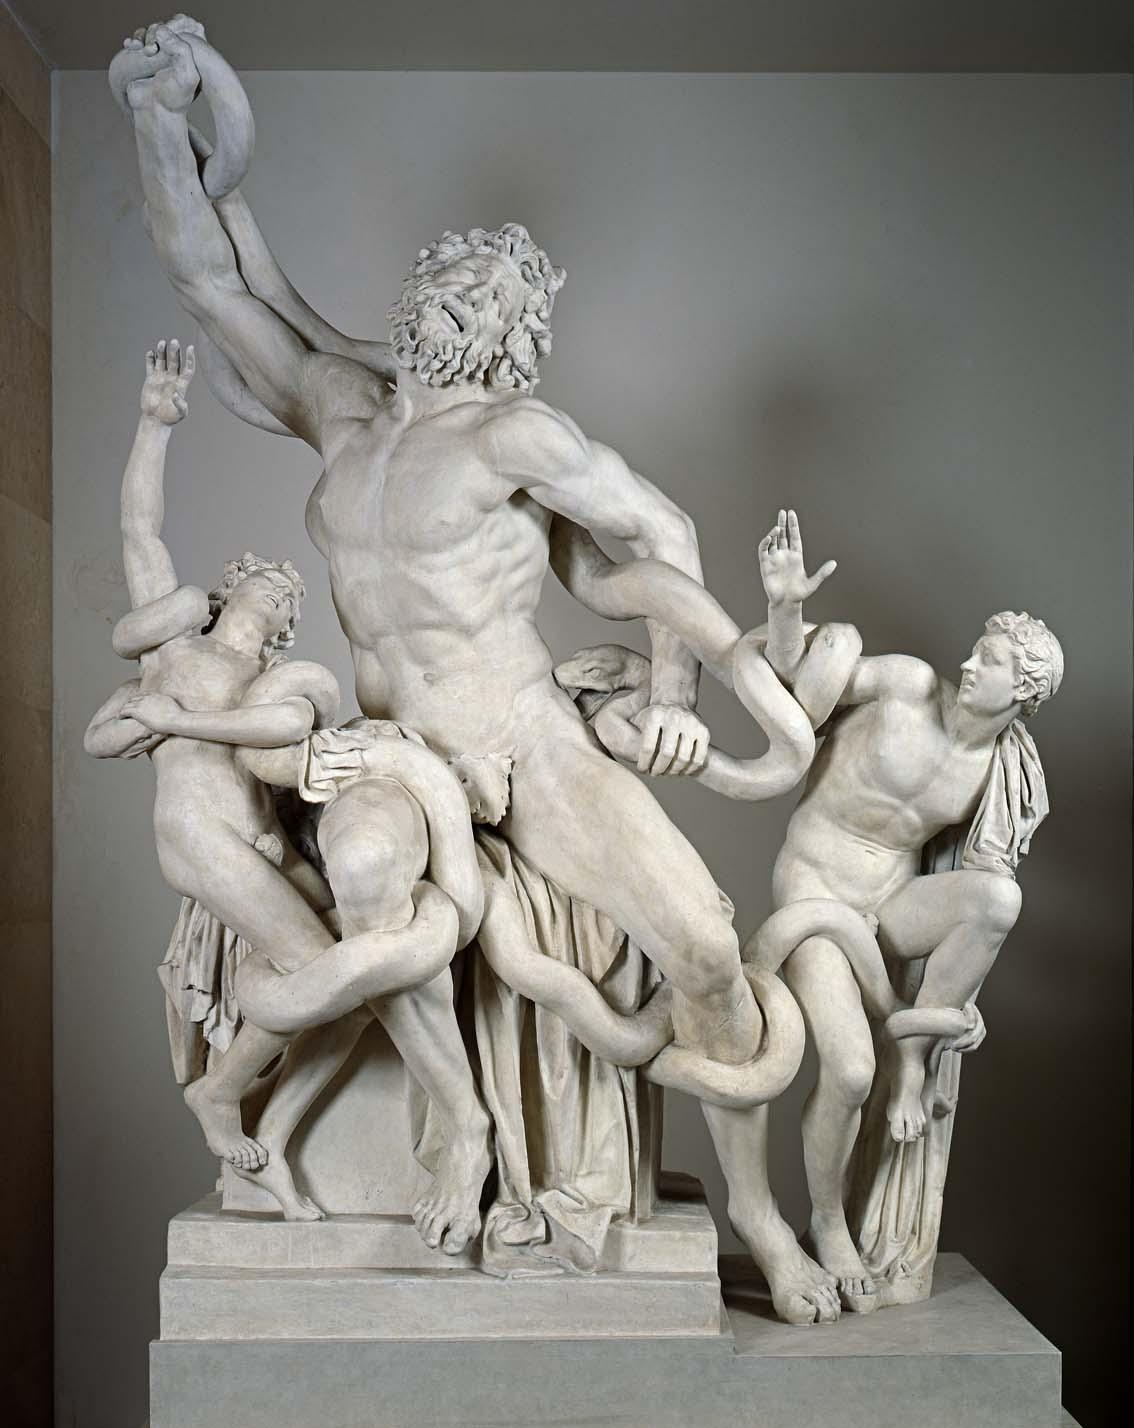 Copia del gruppo del Laocoonte, vaciado de yeso, siglo XIX?, 205 x 158 x 105 cm, Roma, Museo del Vaticano.